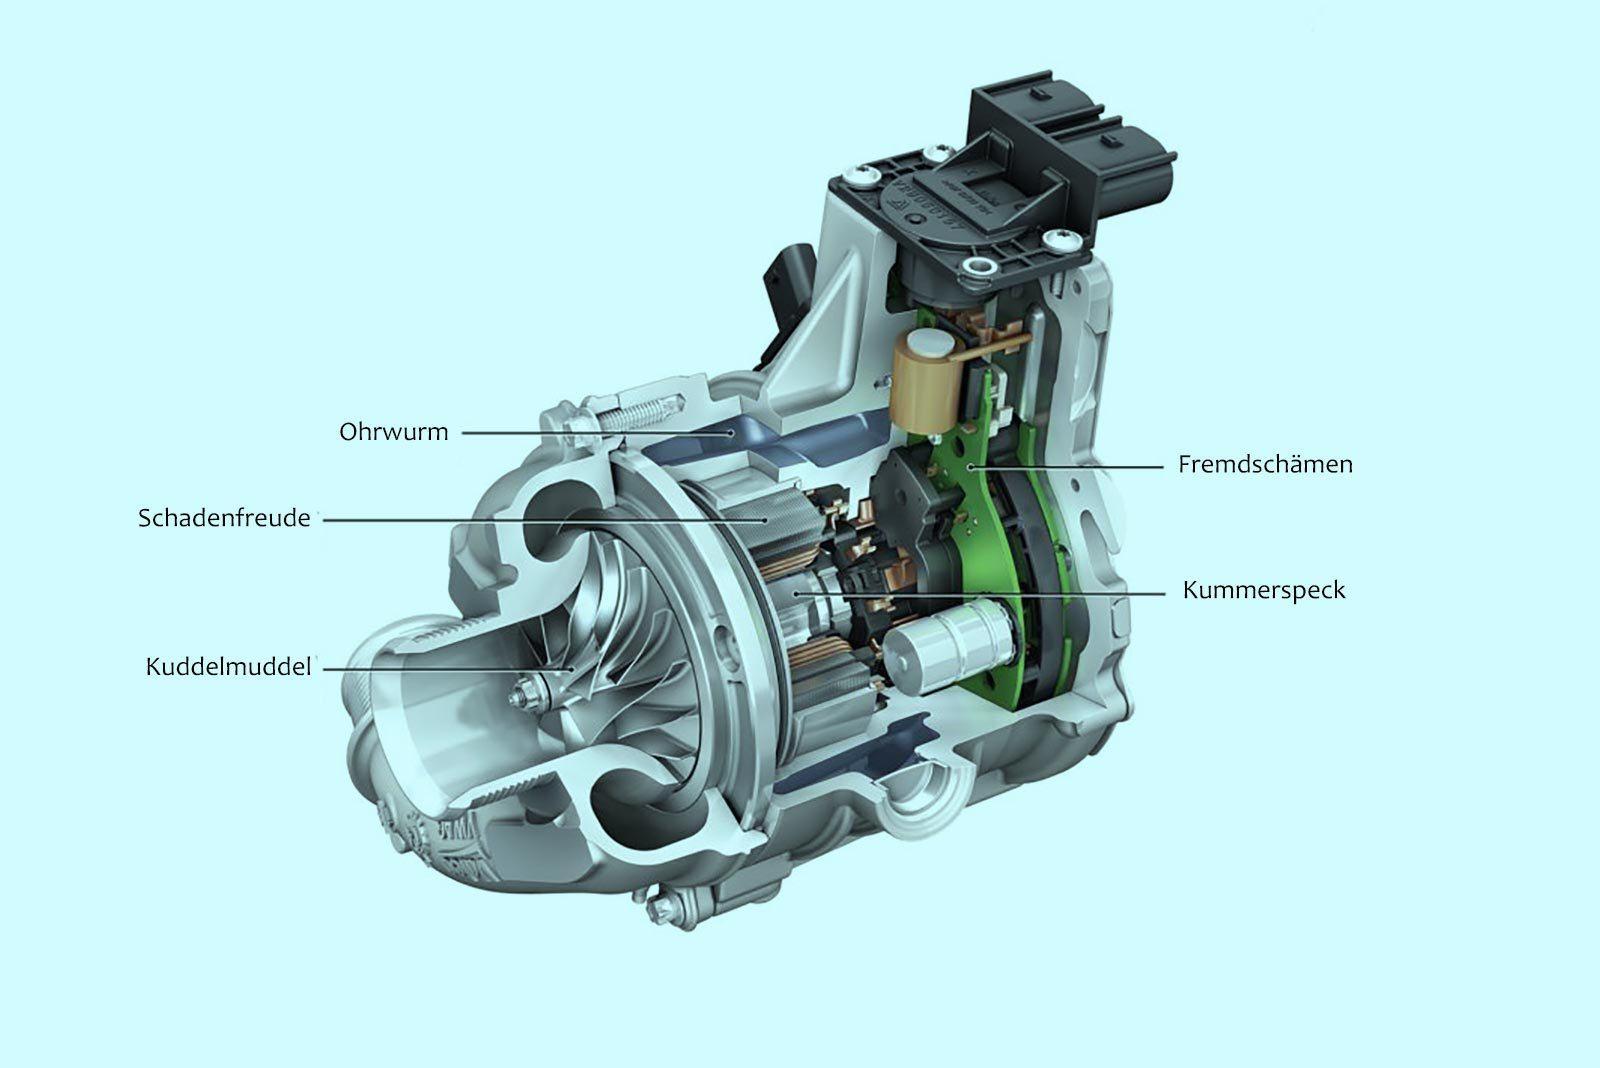 BMW патентует электронагнетатель для S1000RR